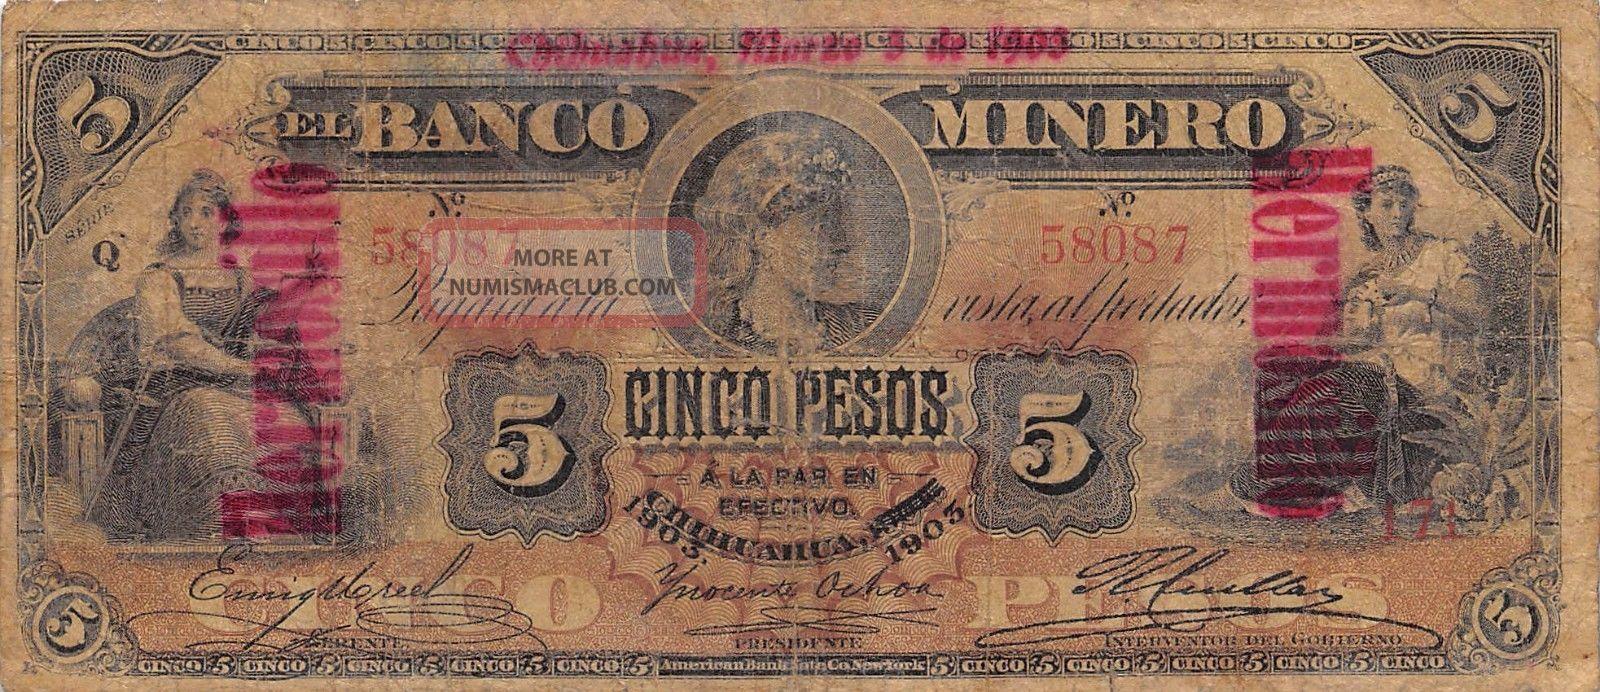 México / Hermosillo / Chihuahua 5 Pesos 3.  3.  1903 Series Q Circulated Banknote North & Central America photo